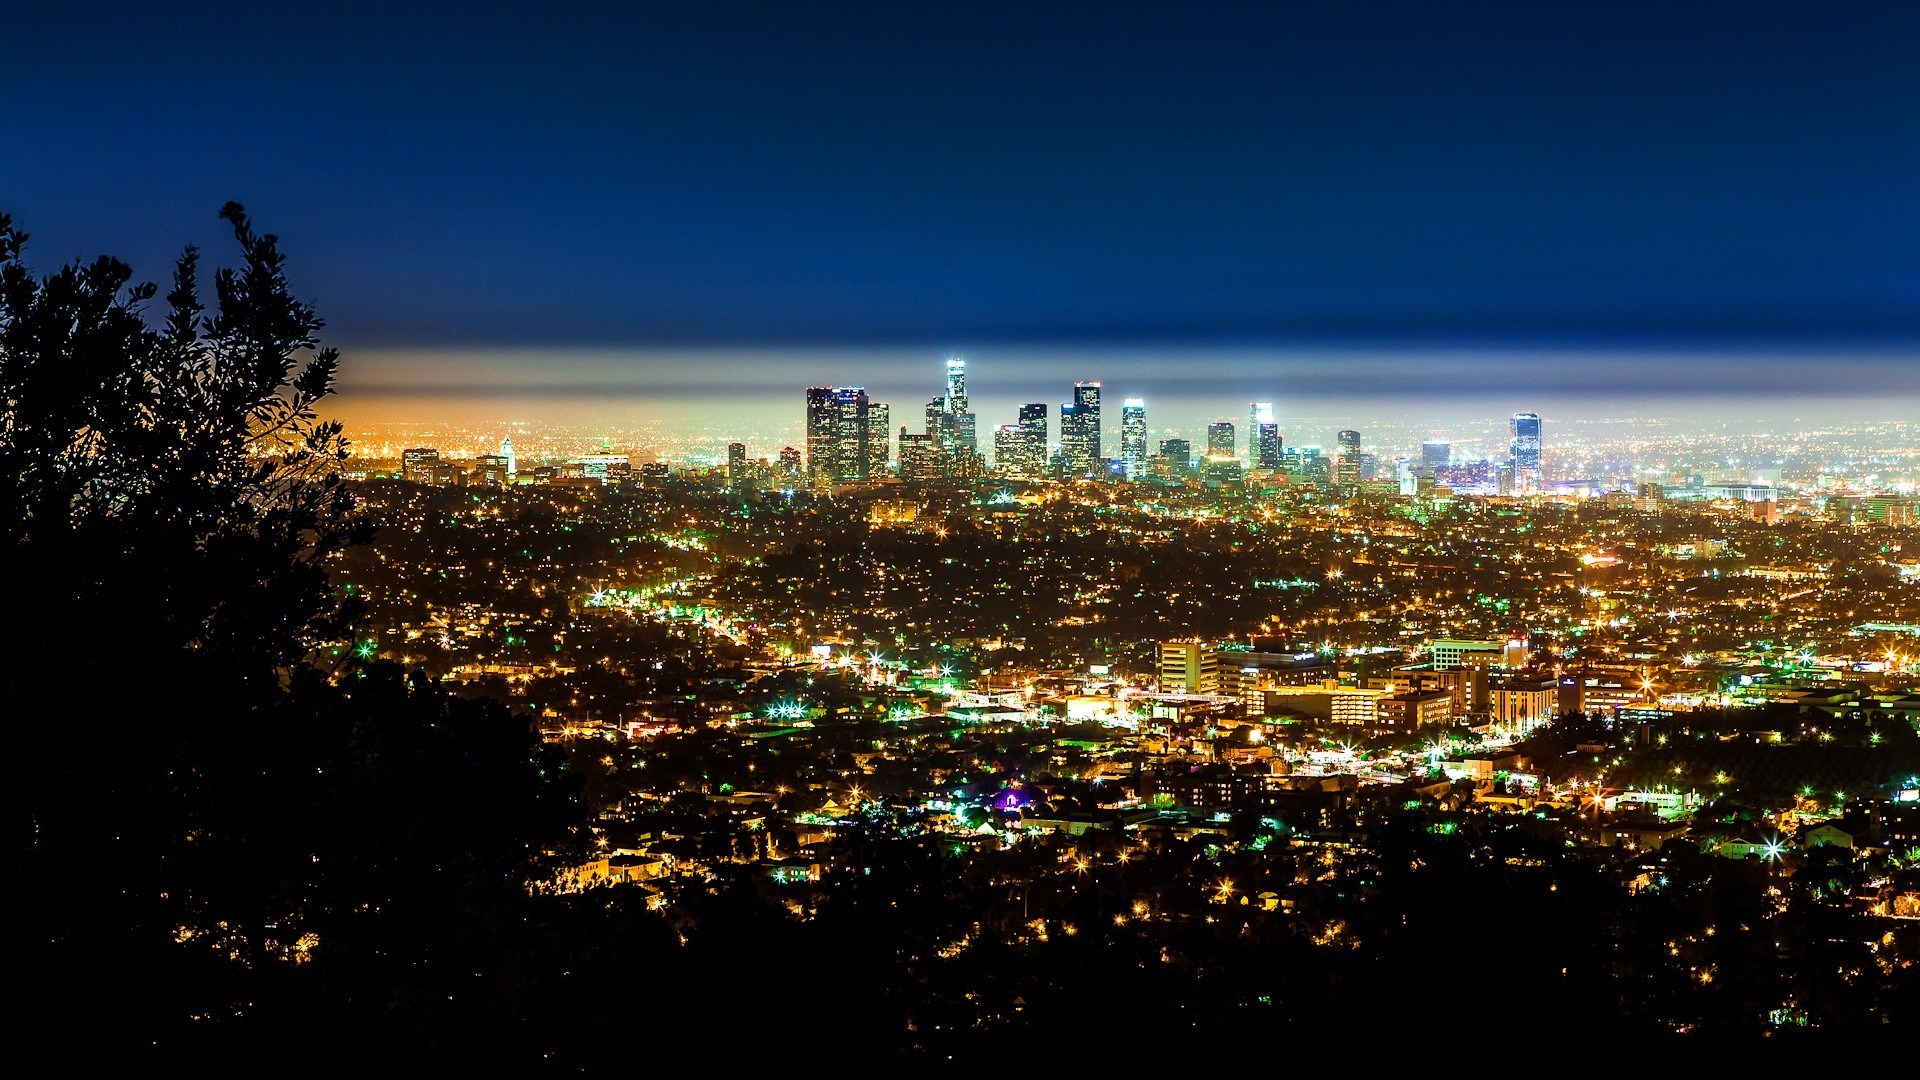 https://cdn.wonderfulengineering.com/wp-content/uploads/2016/01/Los-Angeles- Wallpaper-2.jpg   Lo$ Angele$   Pinterest   Angeles